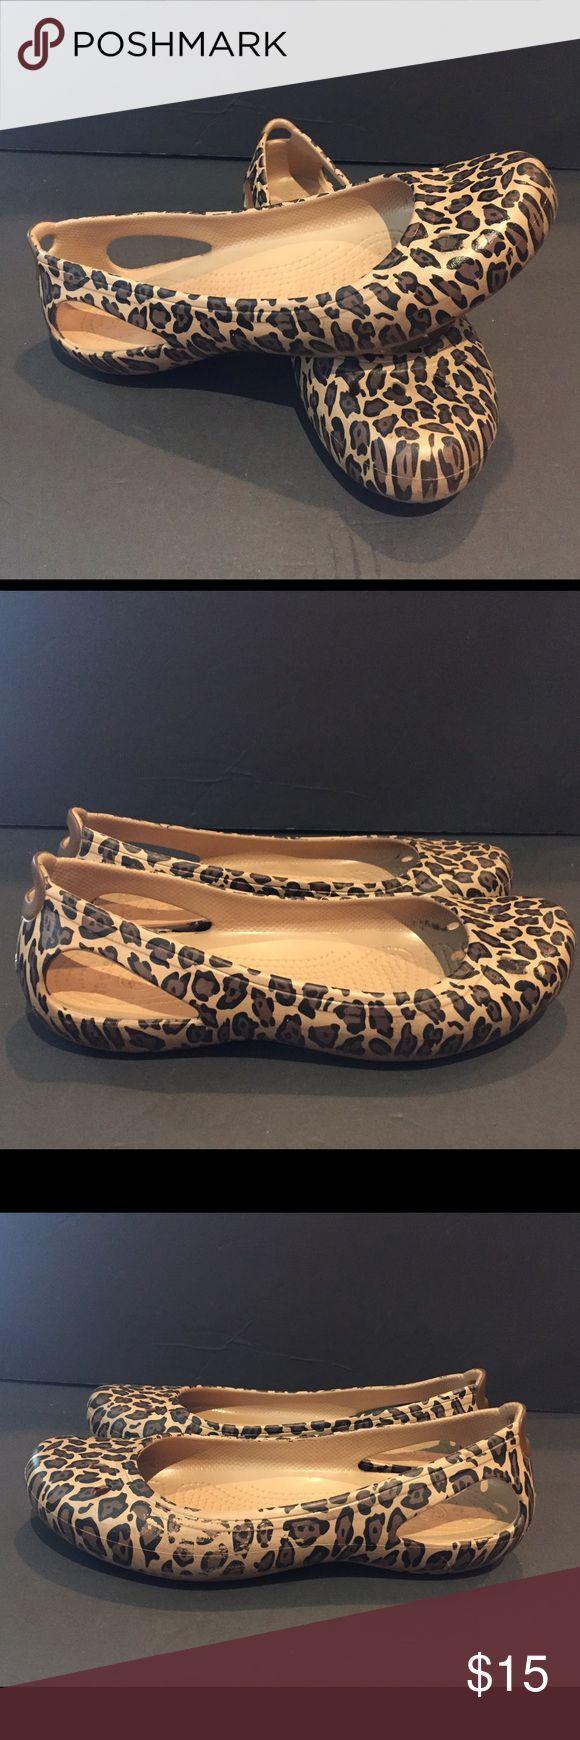 CROCS Lina Leopard 9 Shoes Animal Cheetah Flats CROCS Lina Leopard Womens US Size 9 Shoes Animal Cheetah Slingback Flats CROCS Shoes Flats & Loafers